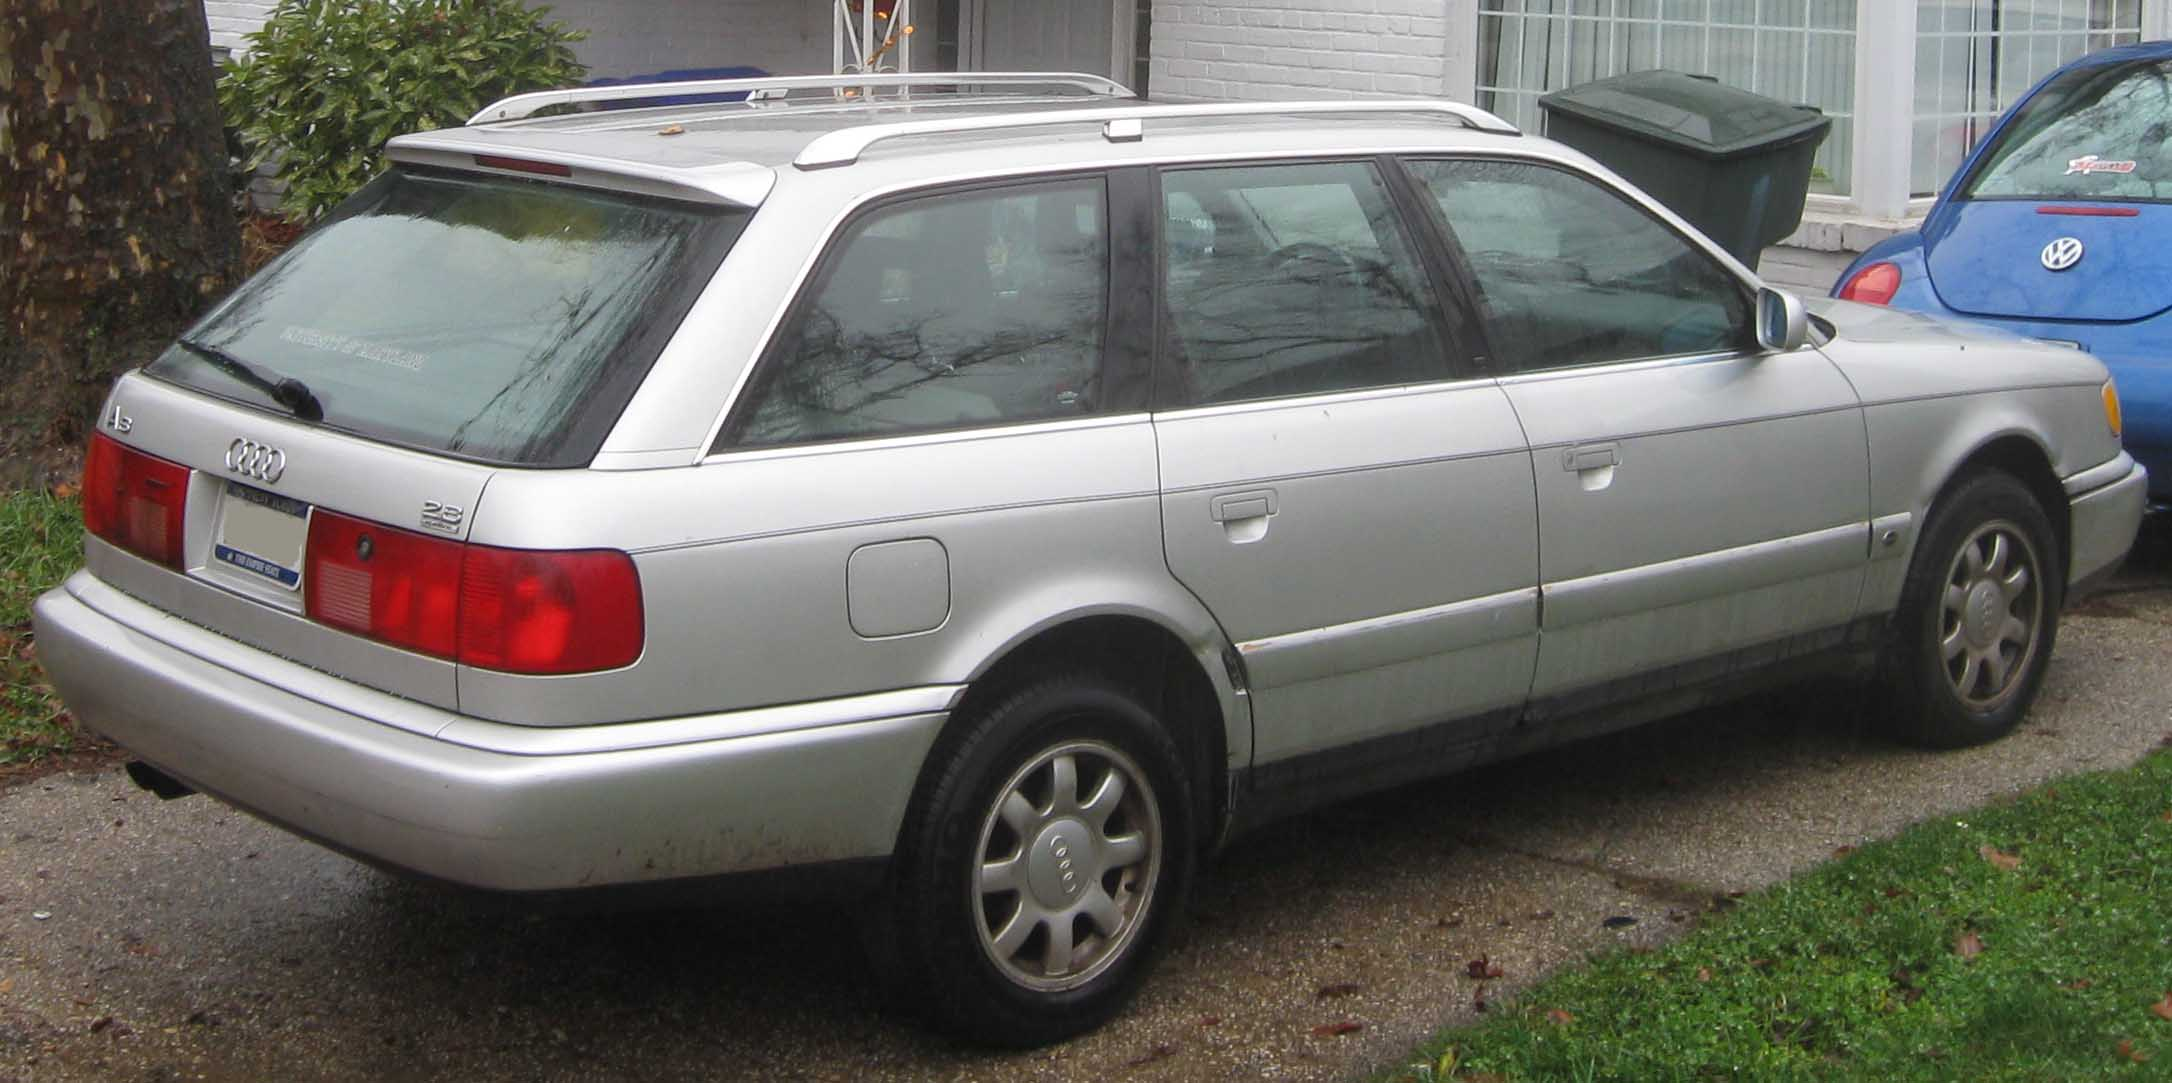 File:Audi A6 2.8 wagon.jpg